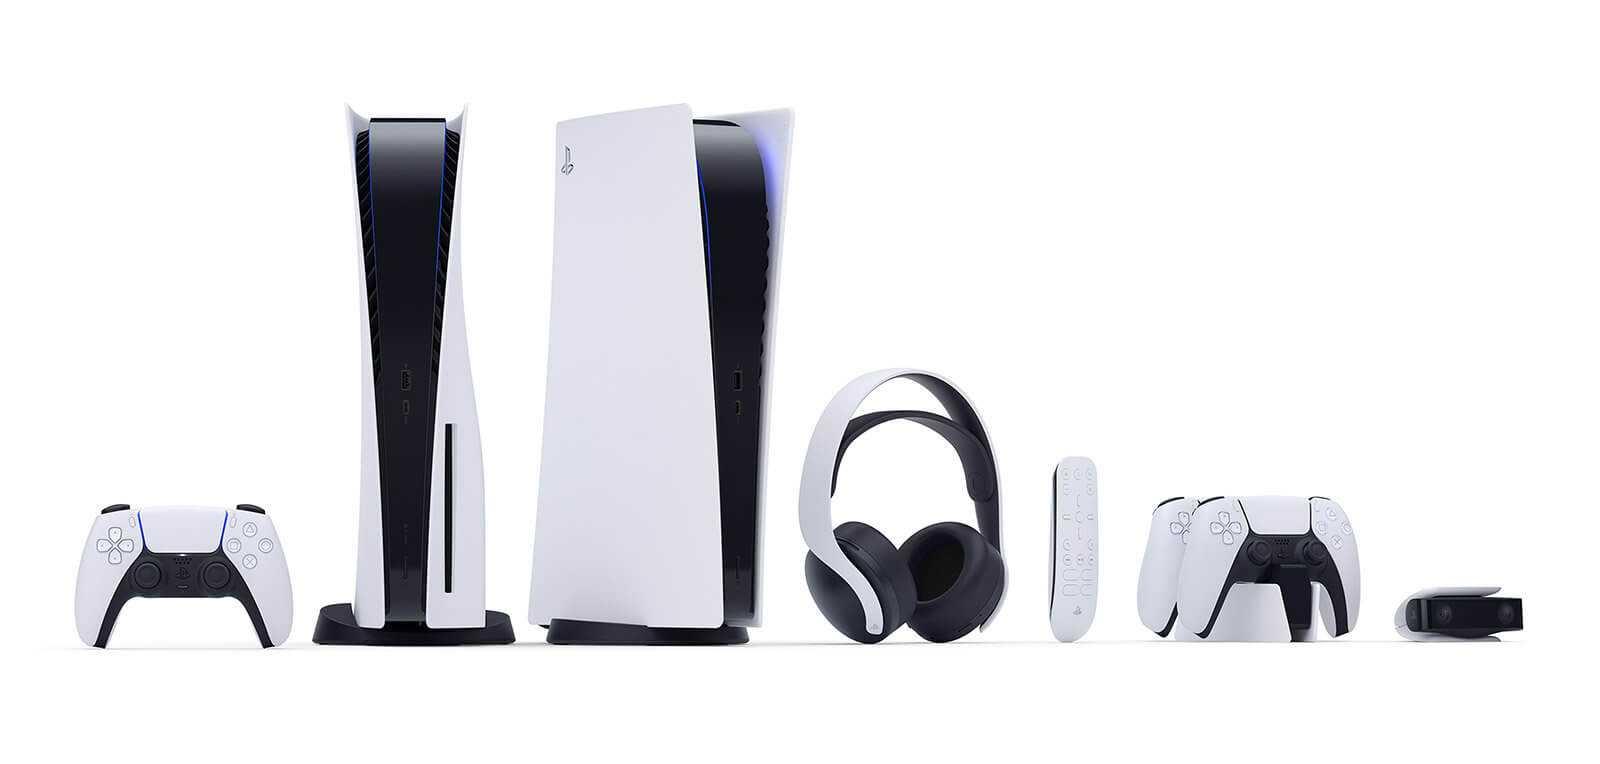 Sony playstation konsole